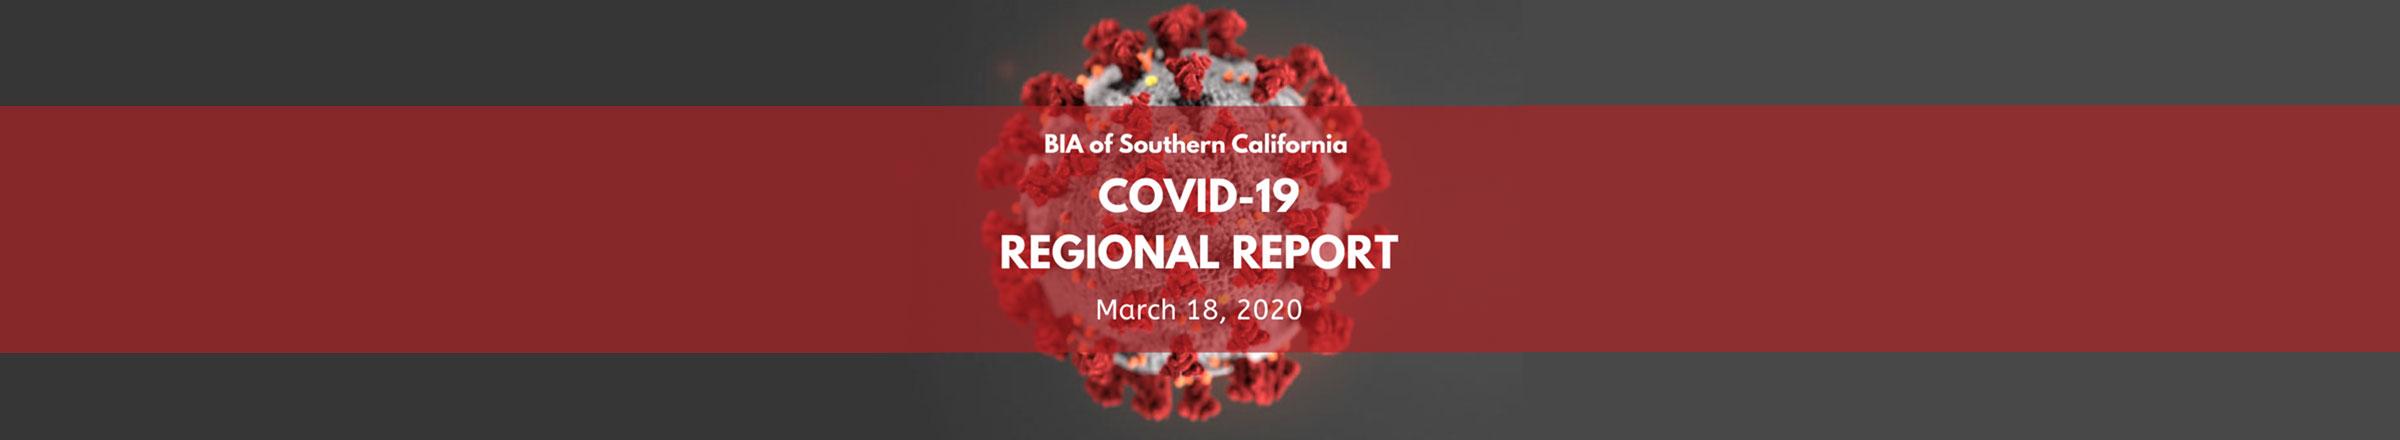 2020-03-20-BIALAV-COVID-19-Updates